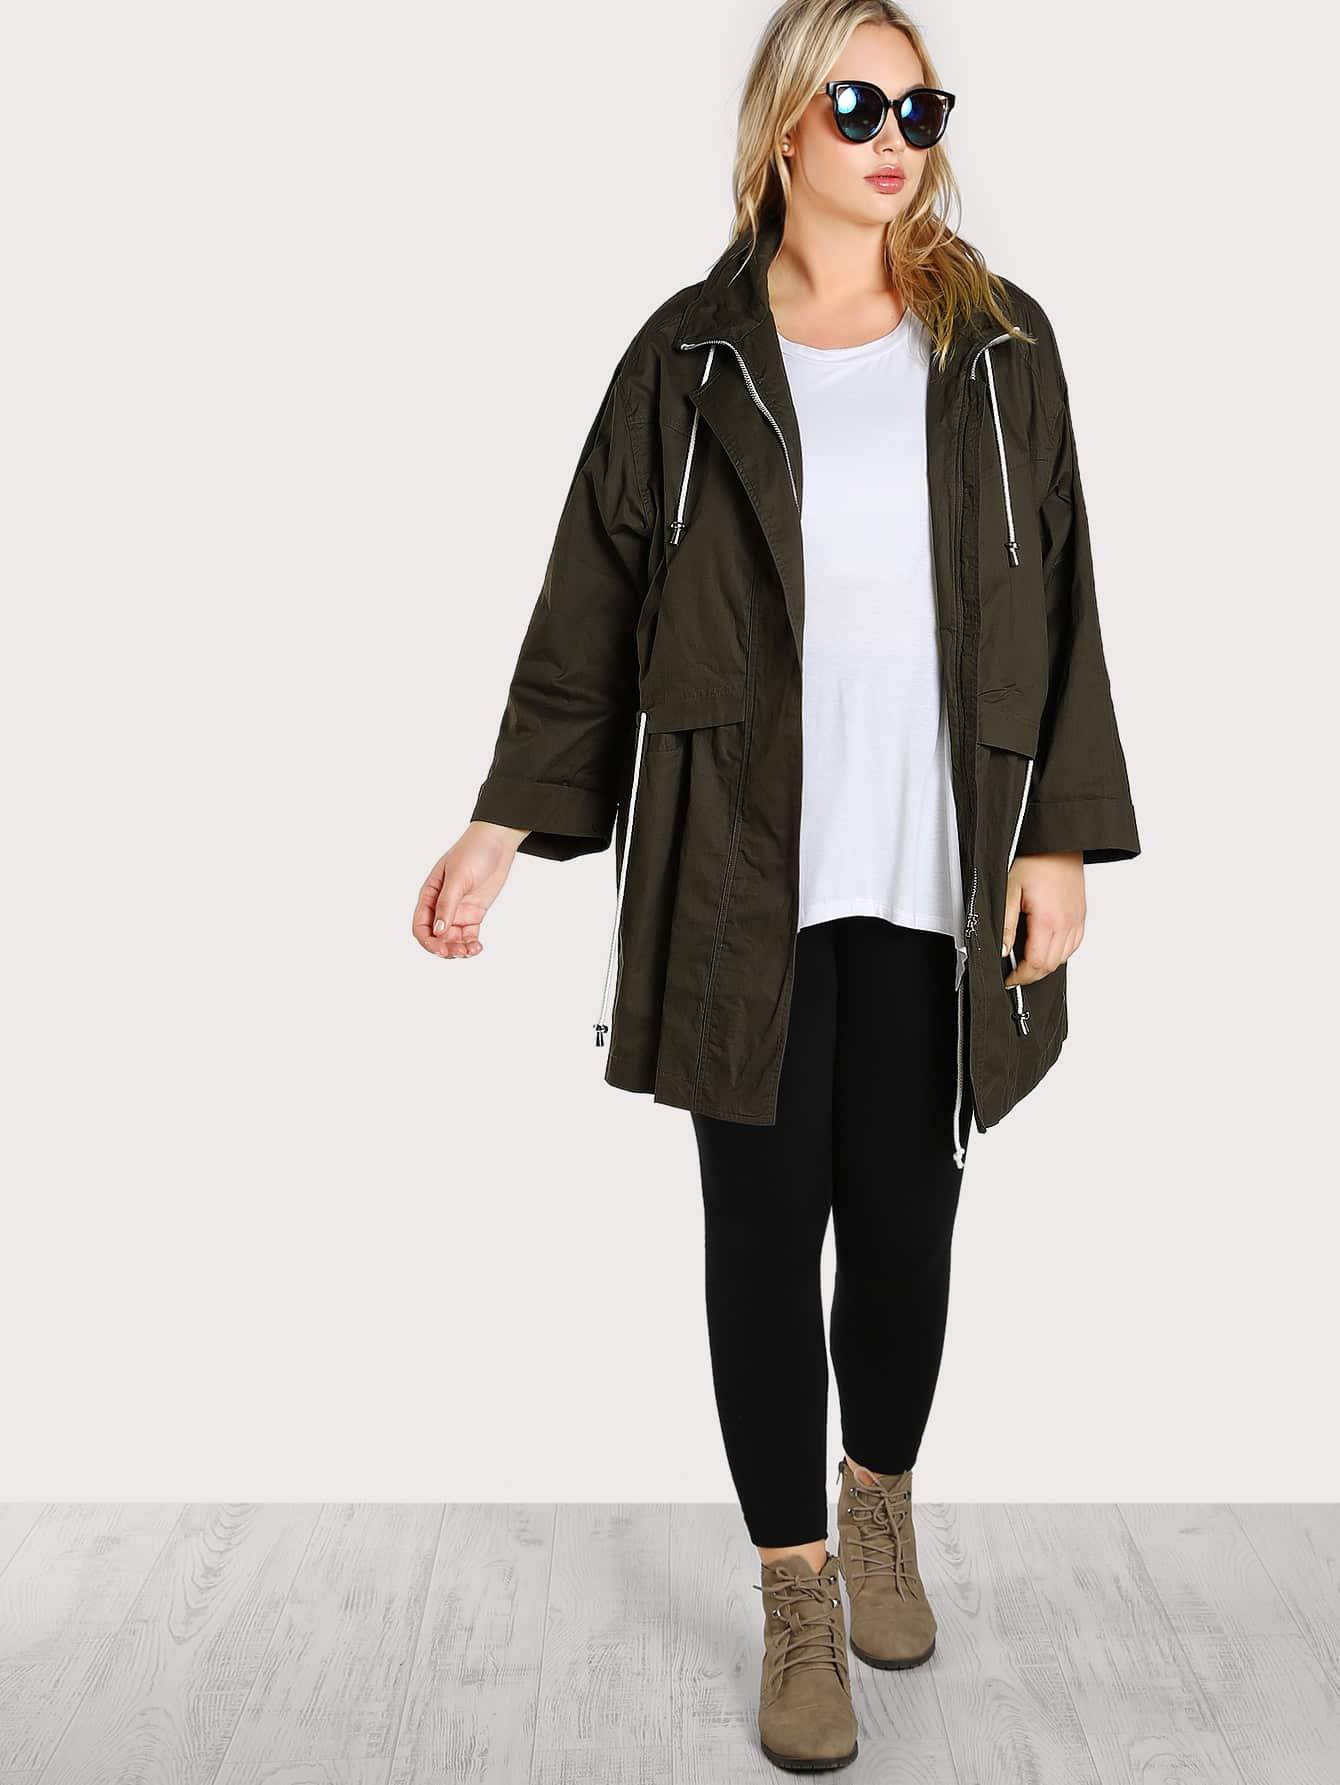 Zip Up Drawstring Jacket fossil sydney patchwork zip clutch